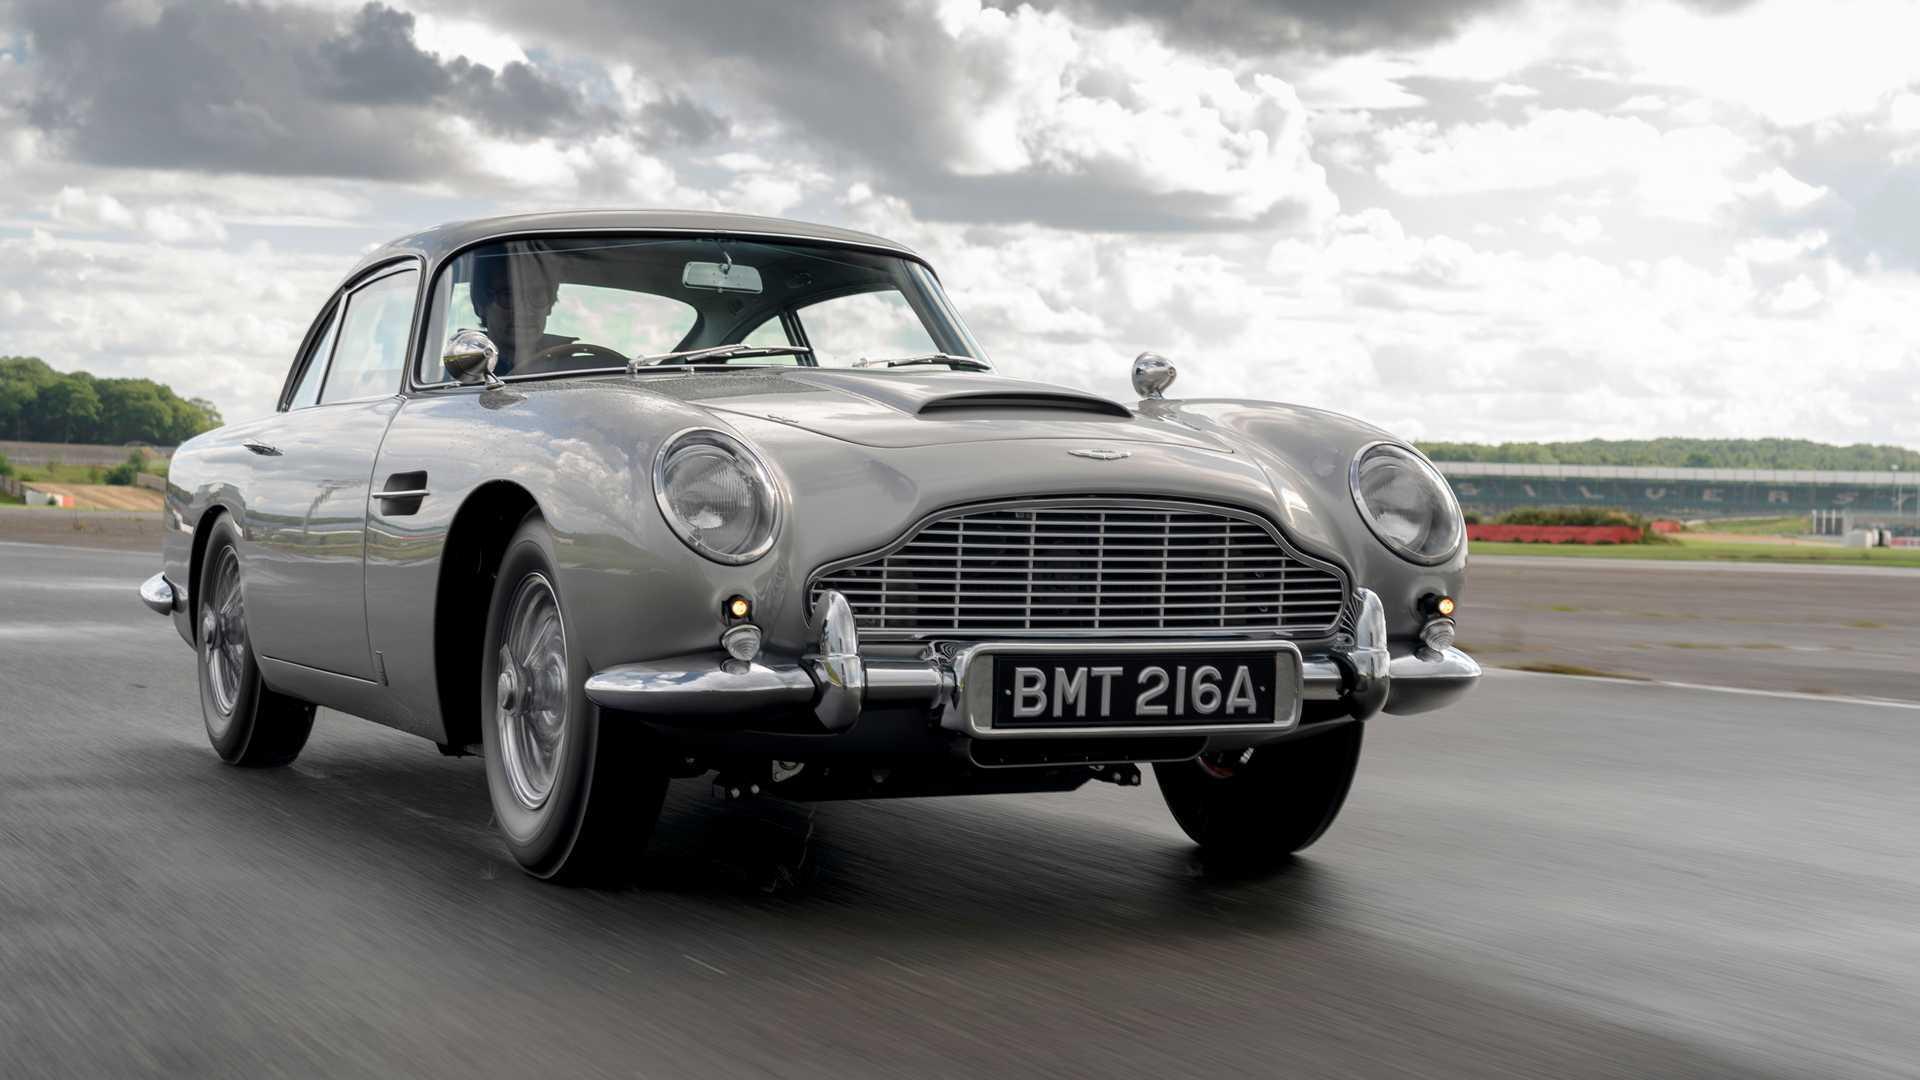 Watch Aston Martin S 3 5m James Bond Car Flex Its Weapon Arsenal